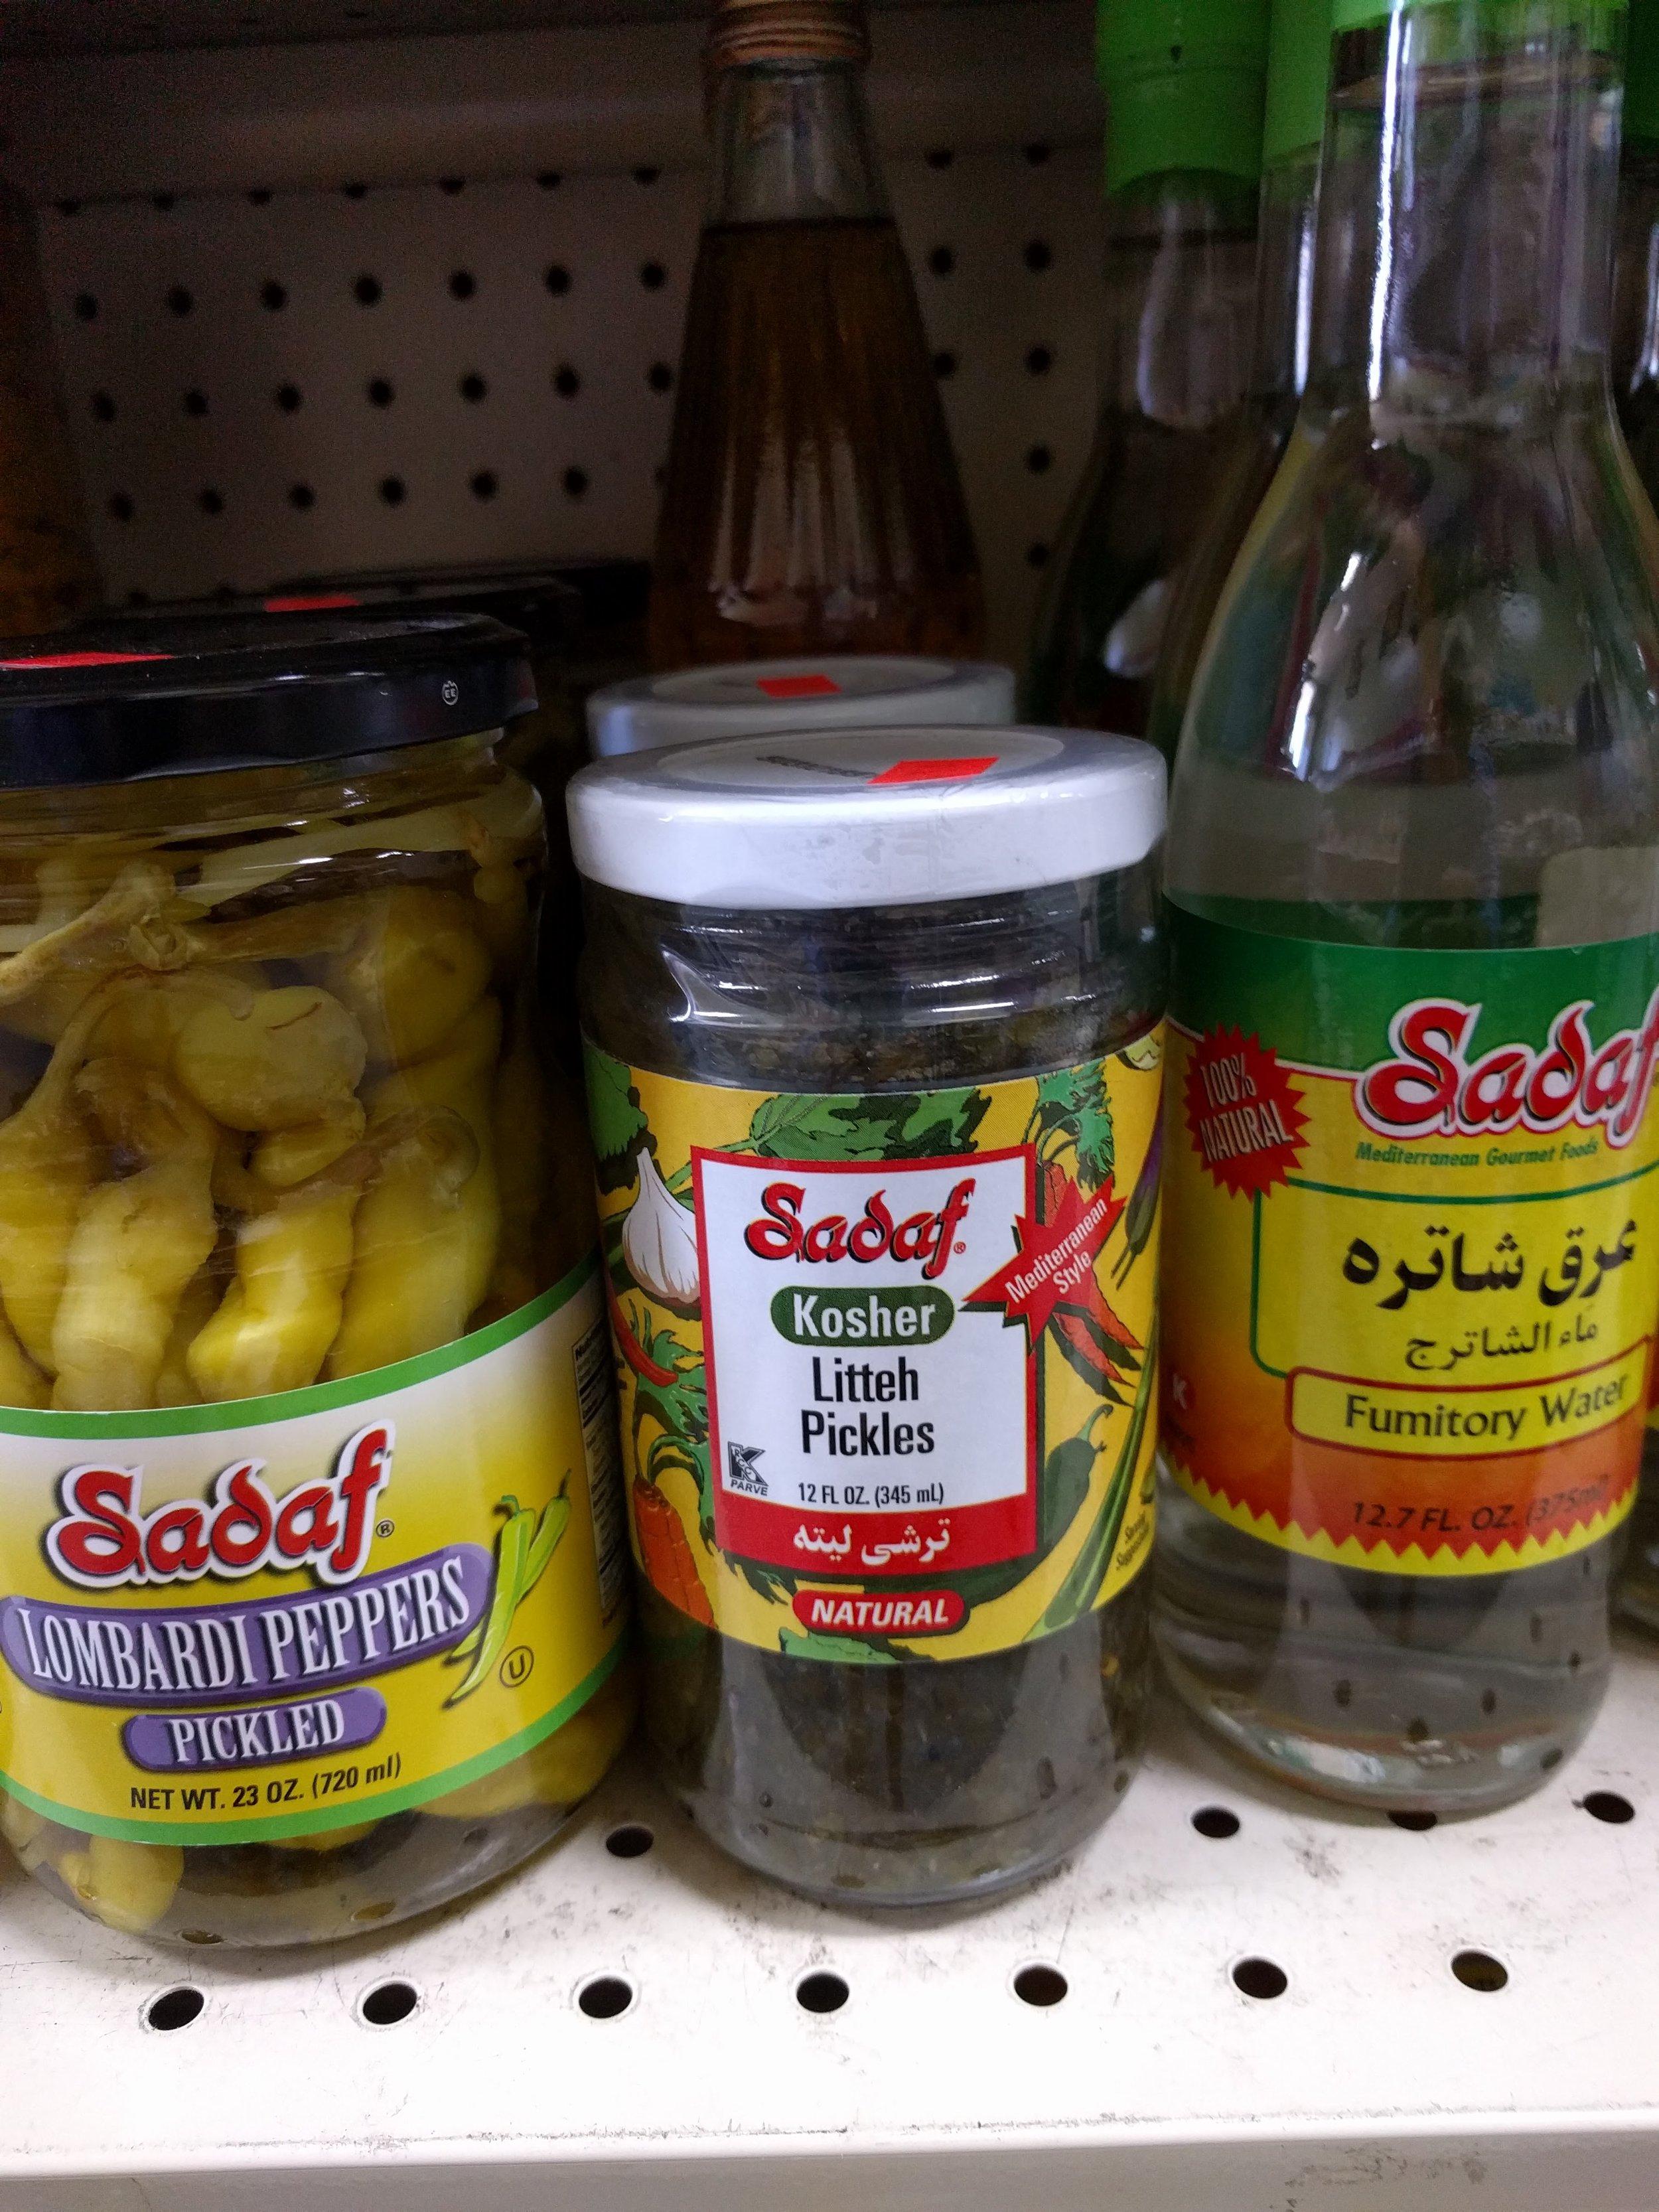 Sadaf-Kosher-Litteh-pickels-Pak-Halal-International-Foods-12259-W-87th-St-Pkwy-Lenexa-KS-66215.jpg